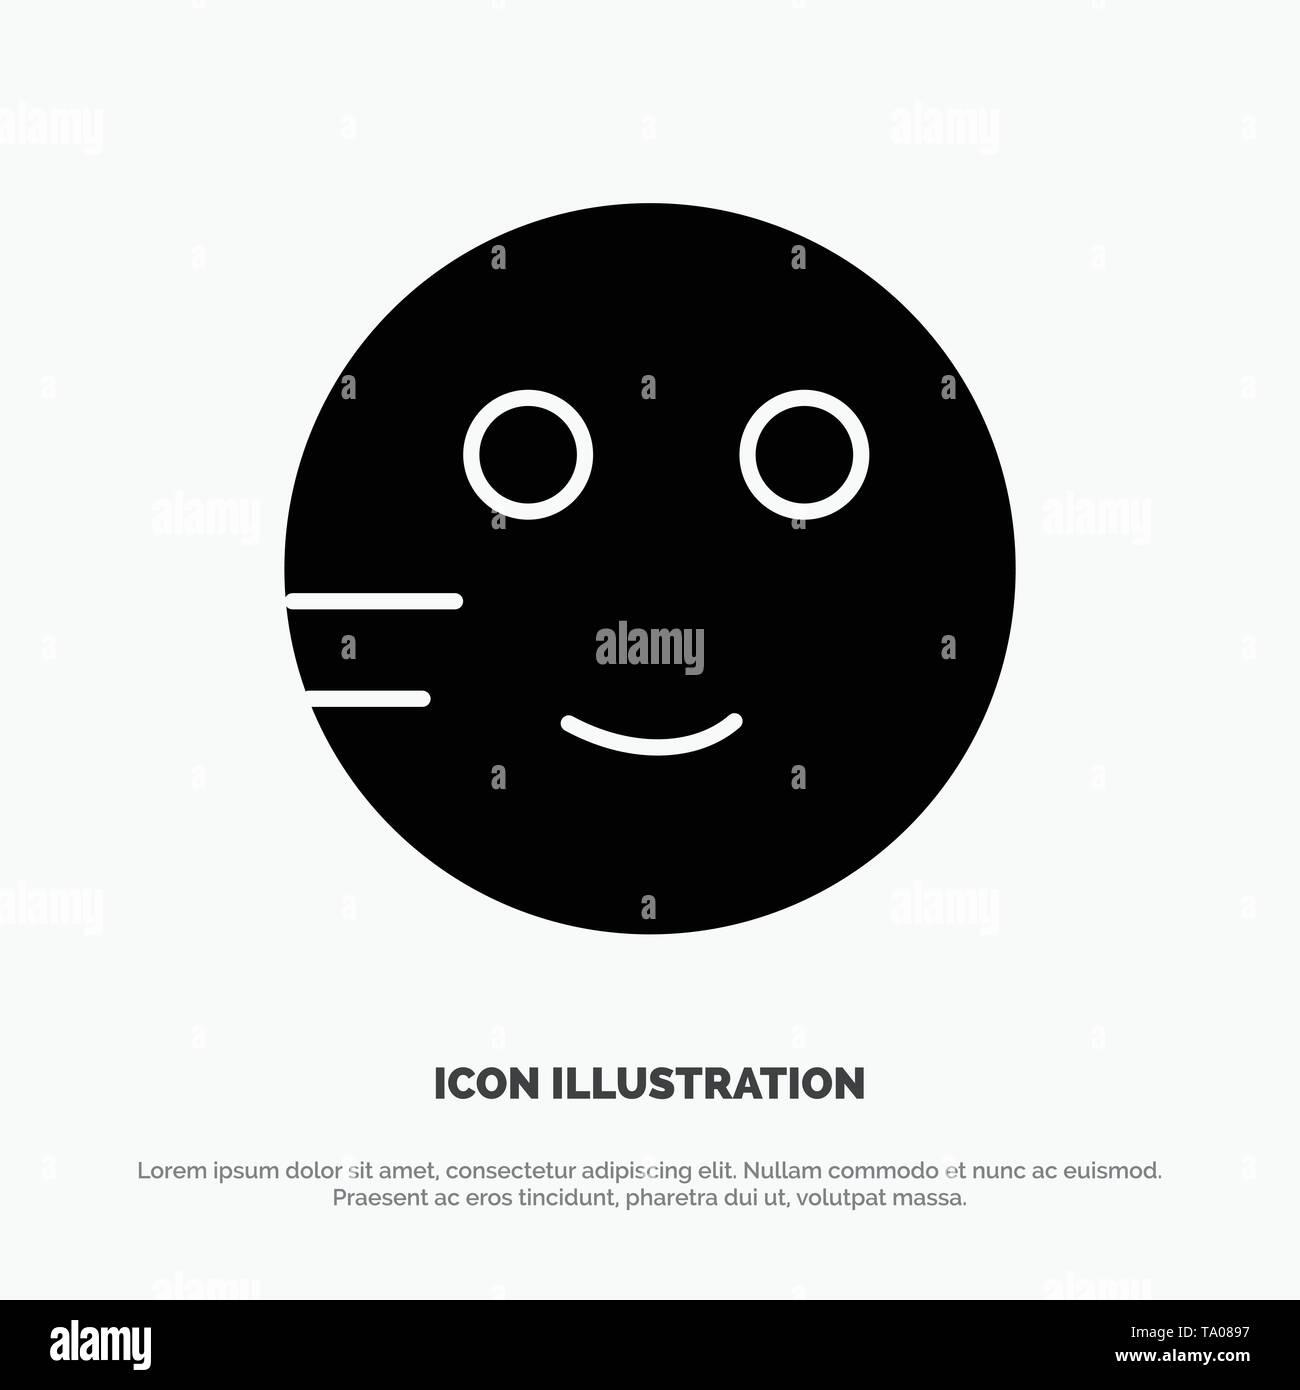 Embarrassed, Emojis, School, Study solid Glyph Icon vector - Stock Image